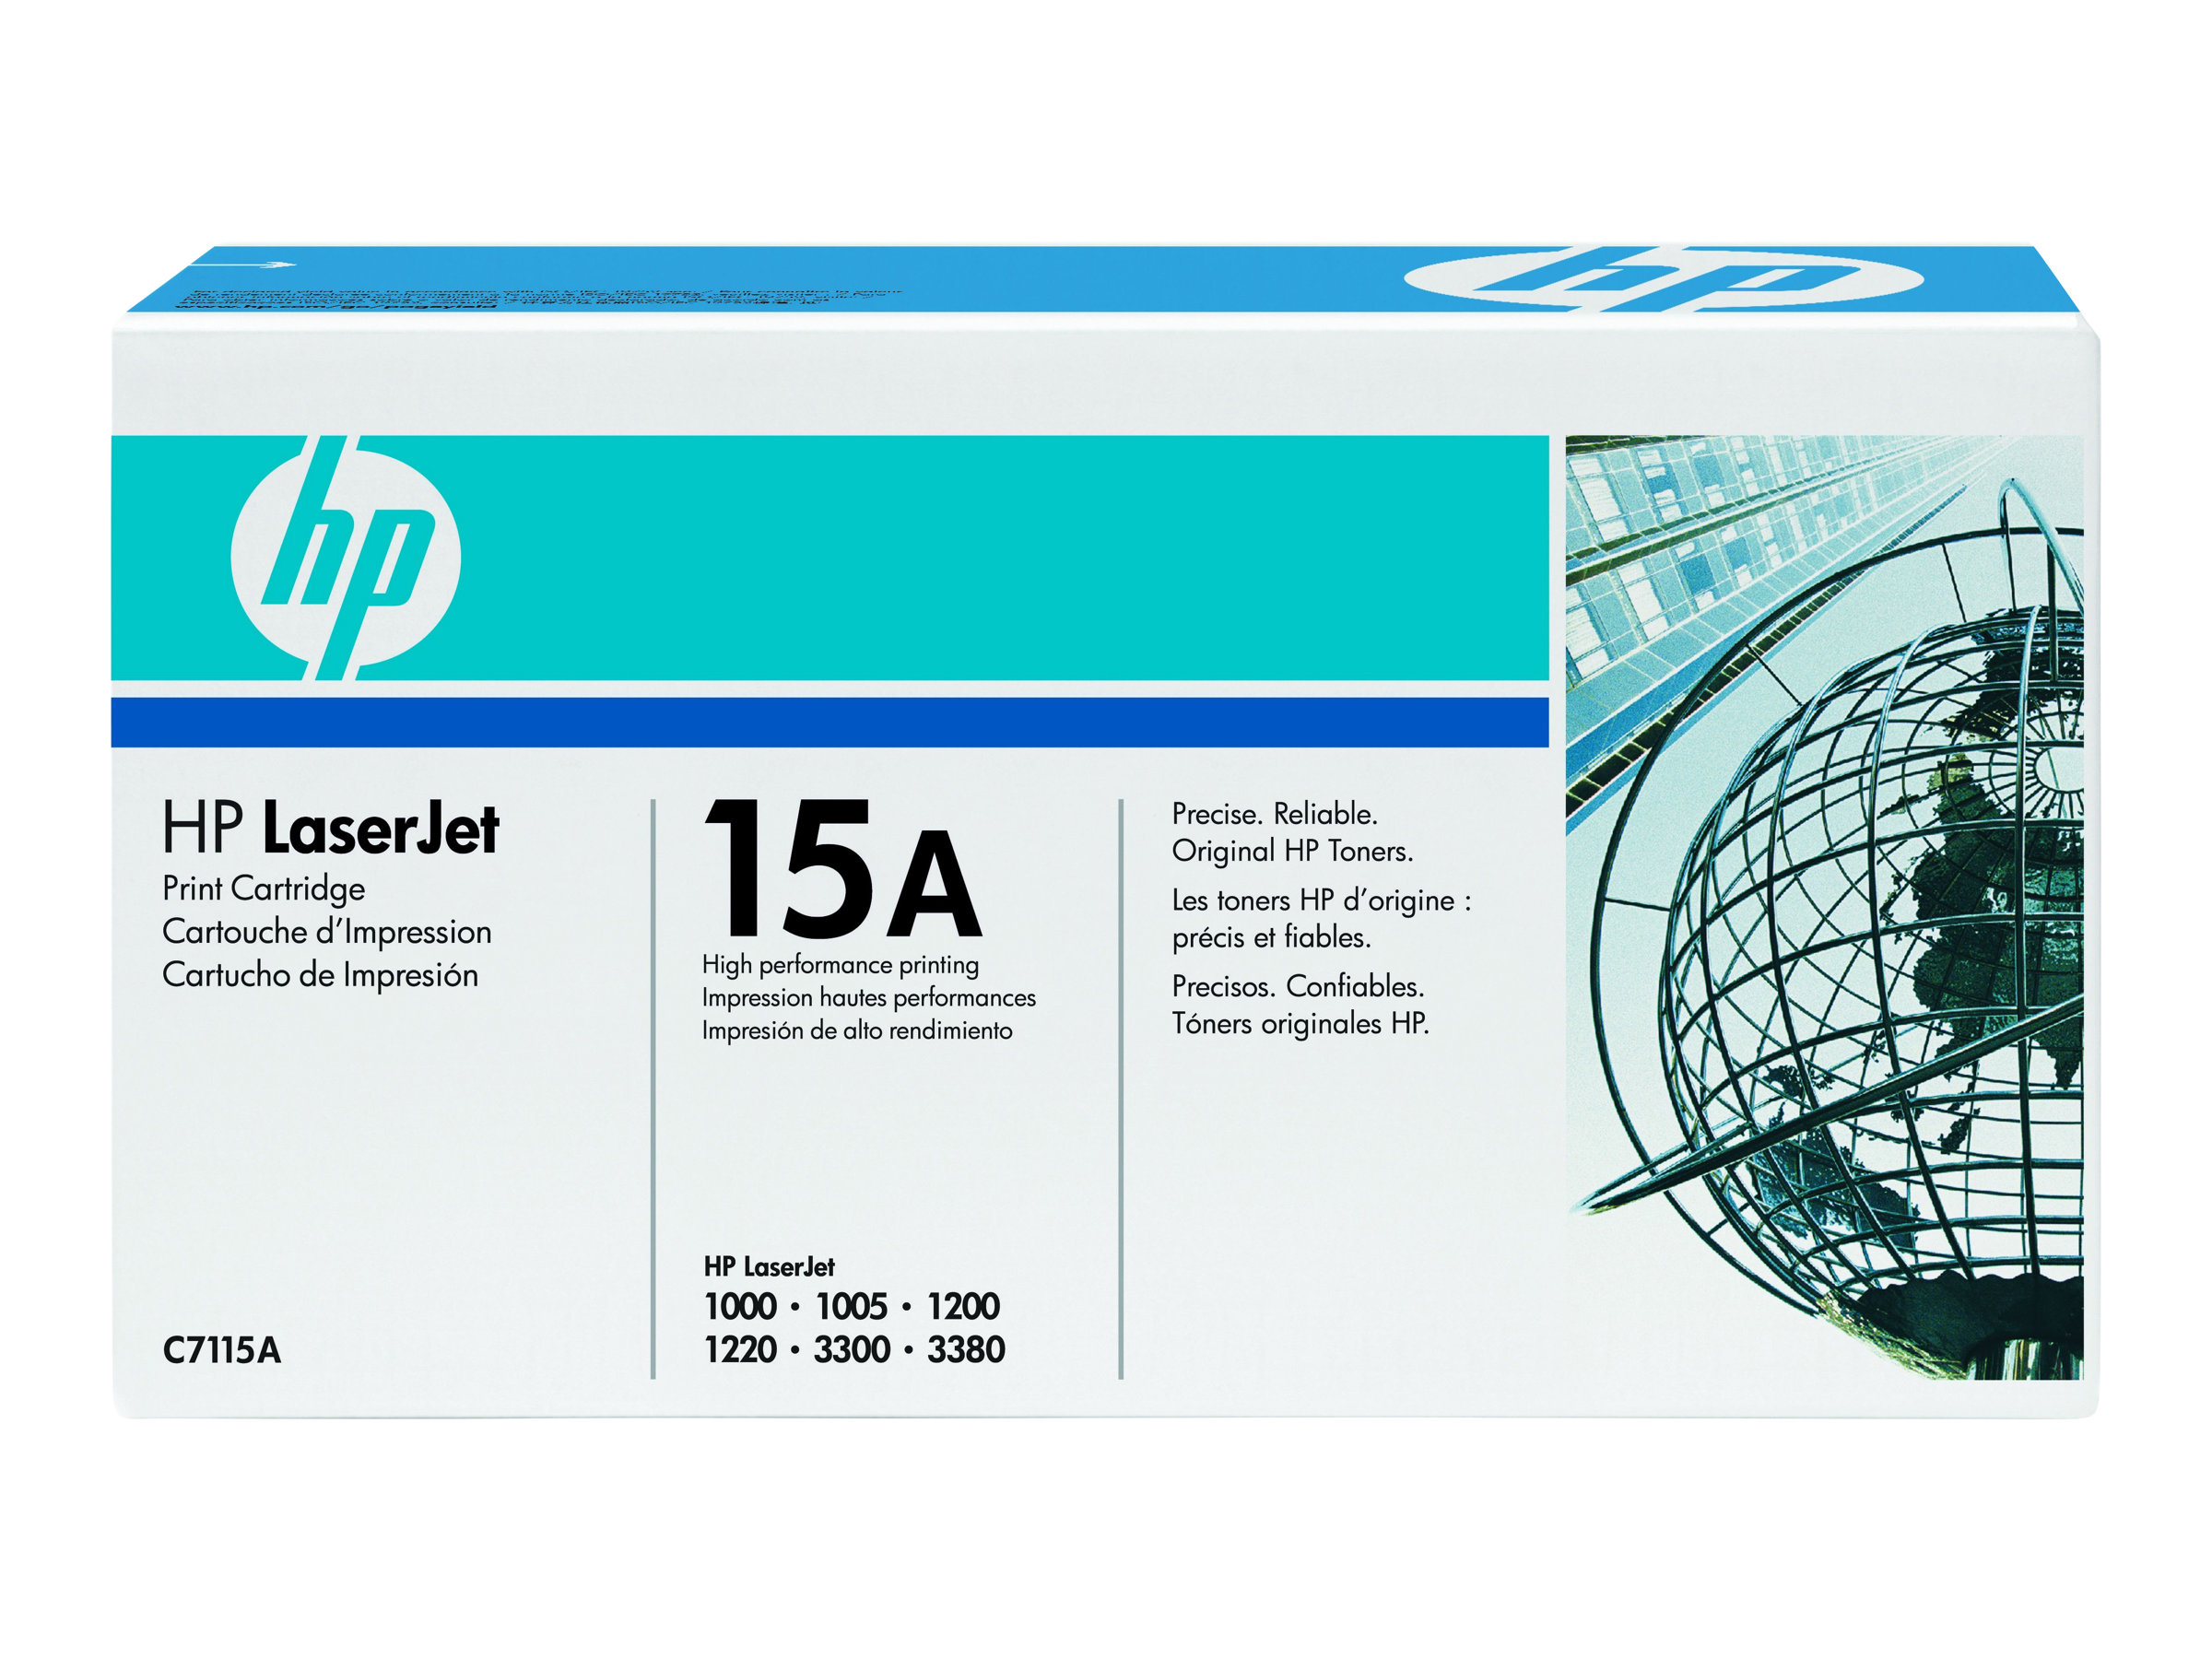 HP 15A - Schwarz - Original - LaserJet - Tonerpatrone (C7115A) - für LaserJet 1000, 1005, 1200, 1220, 3300, 3310, 3320, 3330, 33